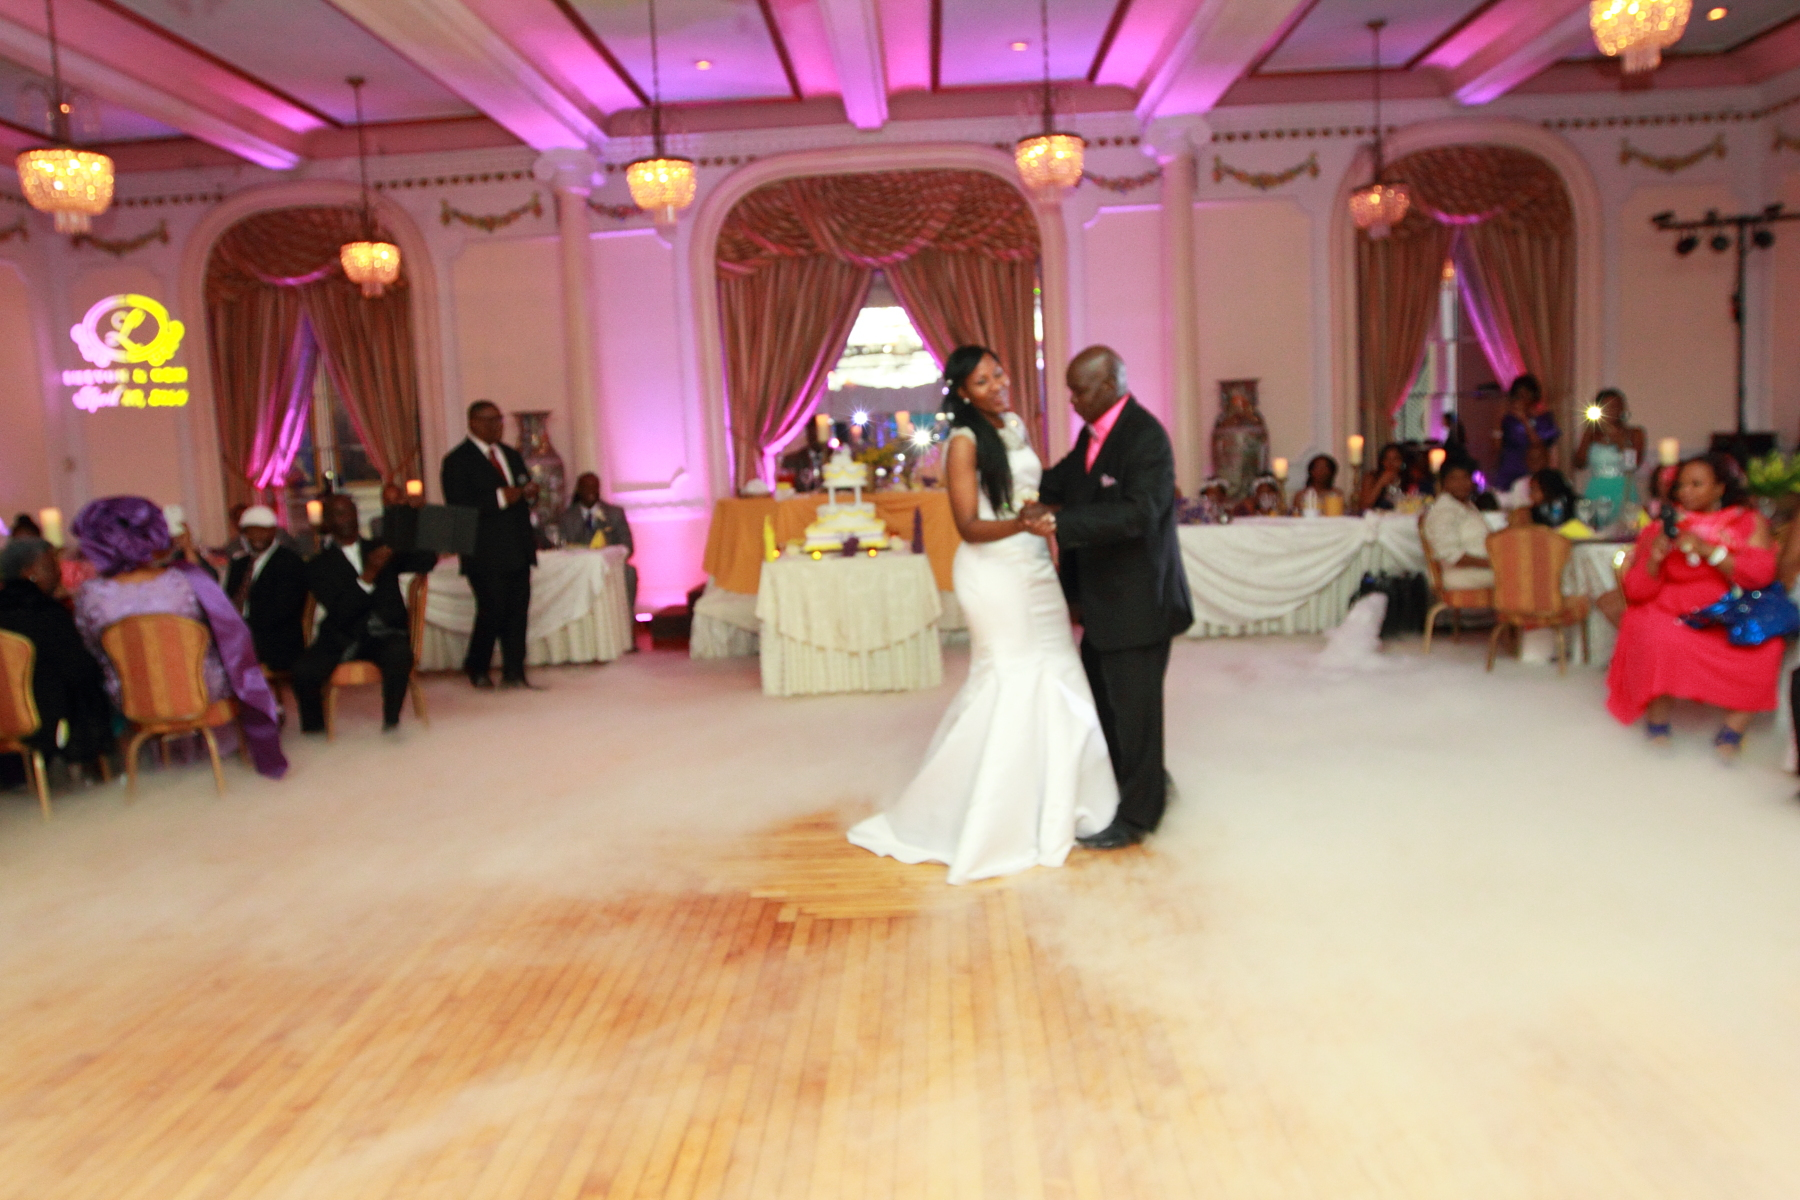 WEDDING EVENT.